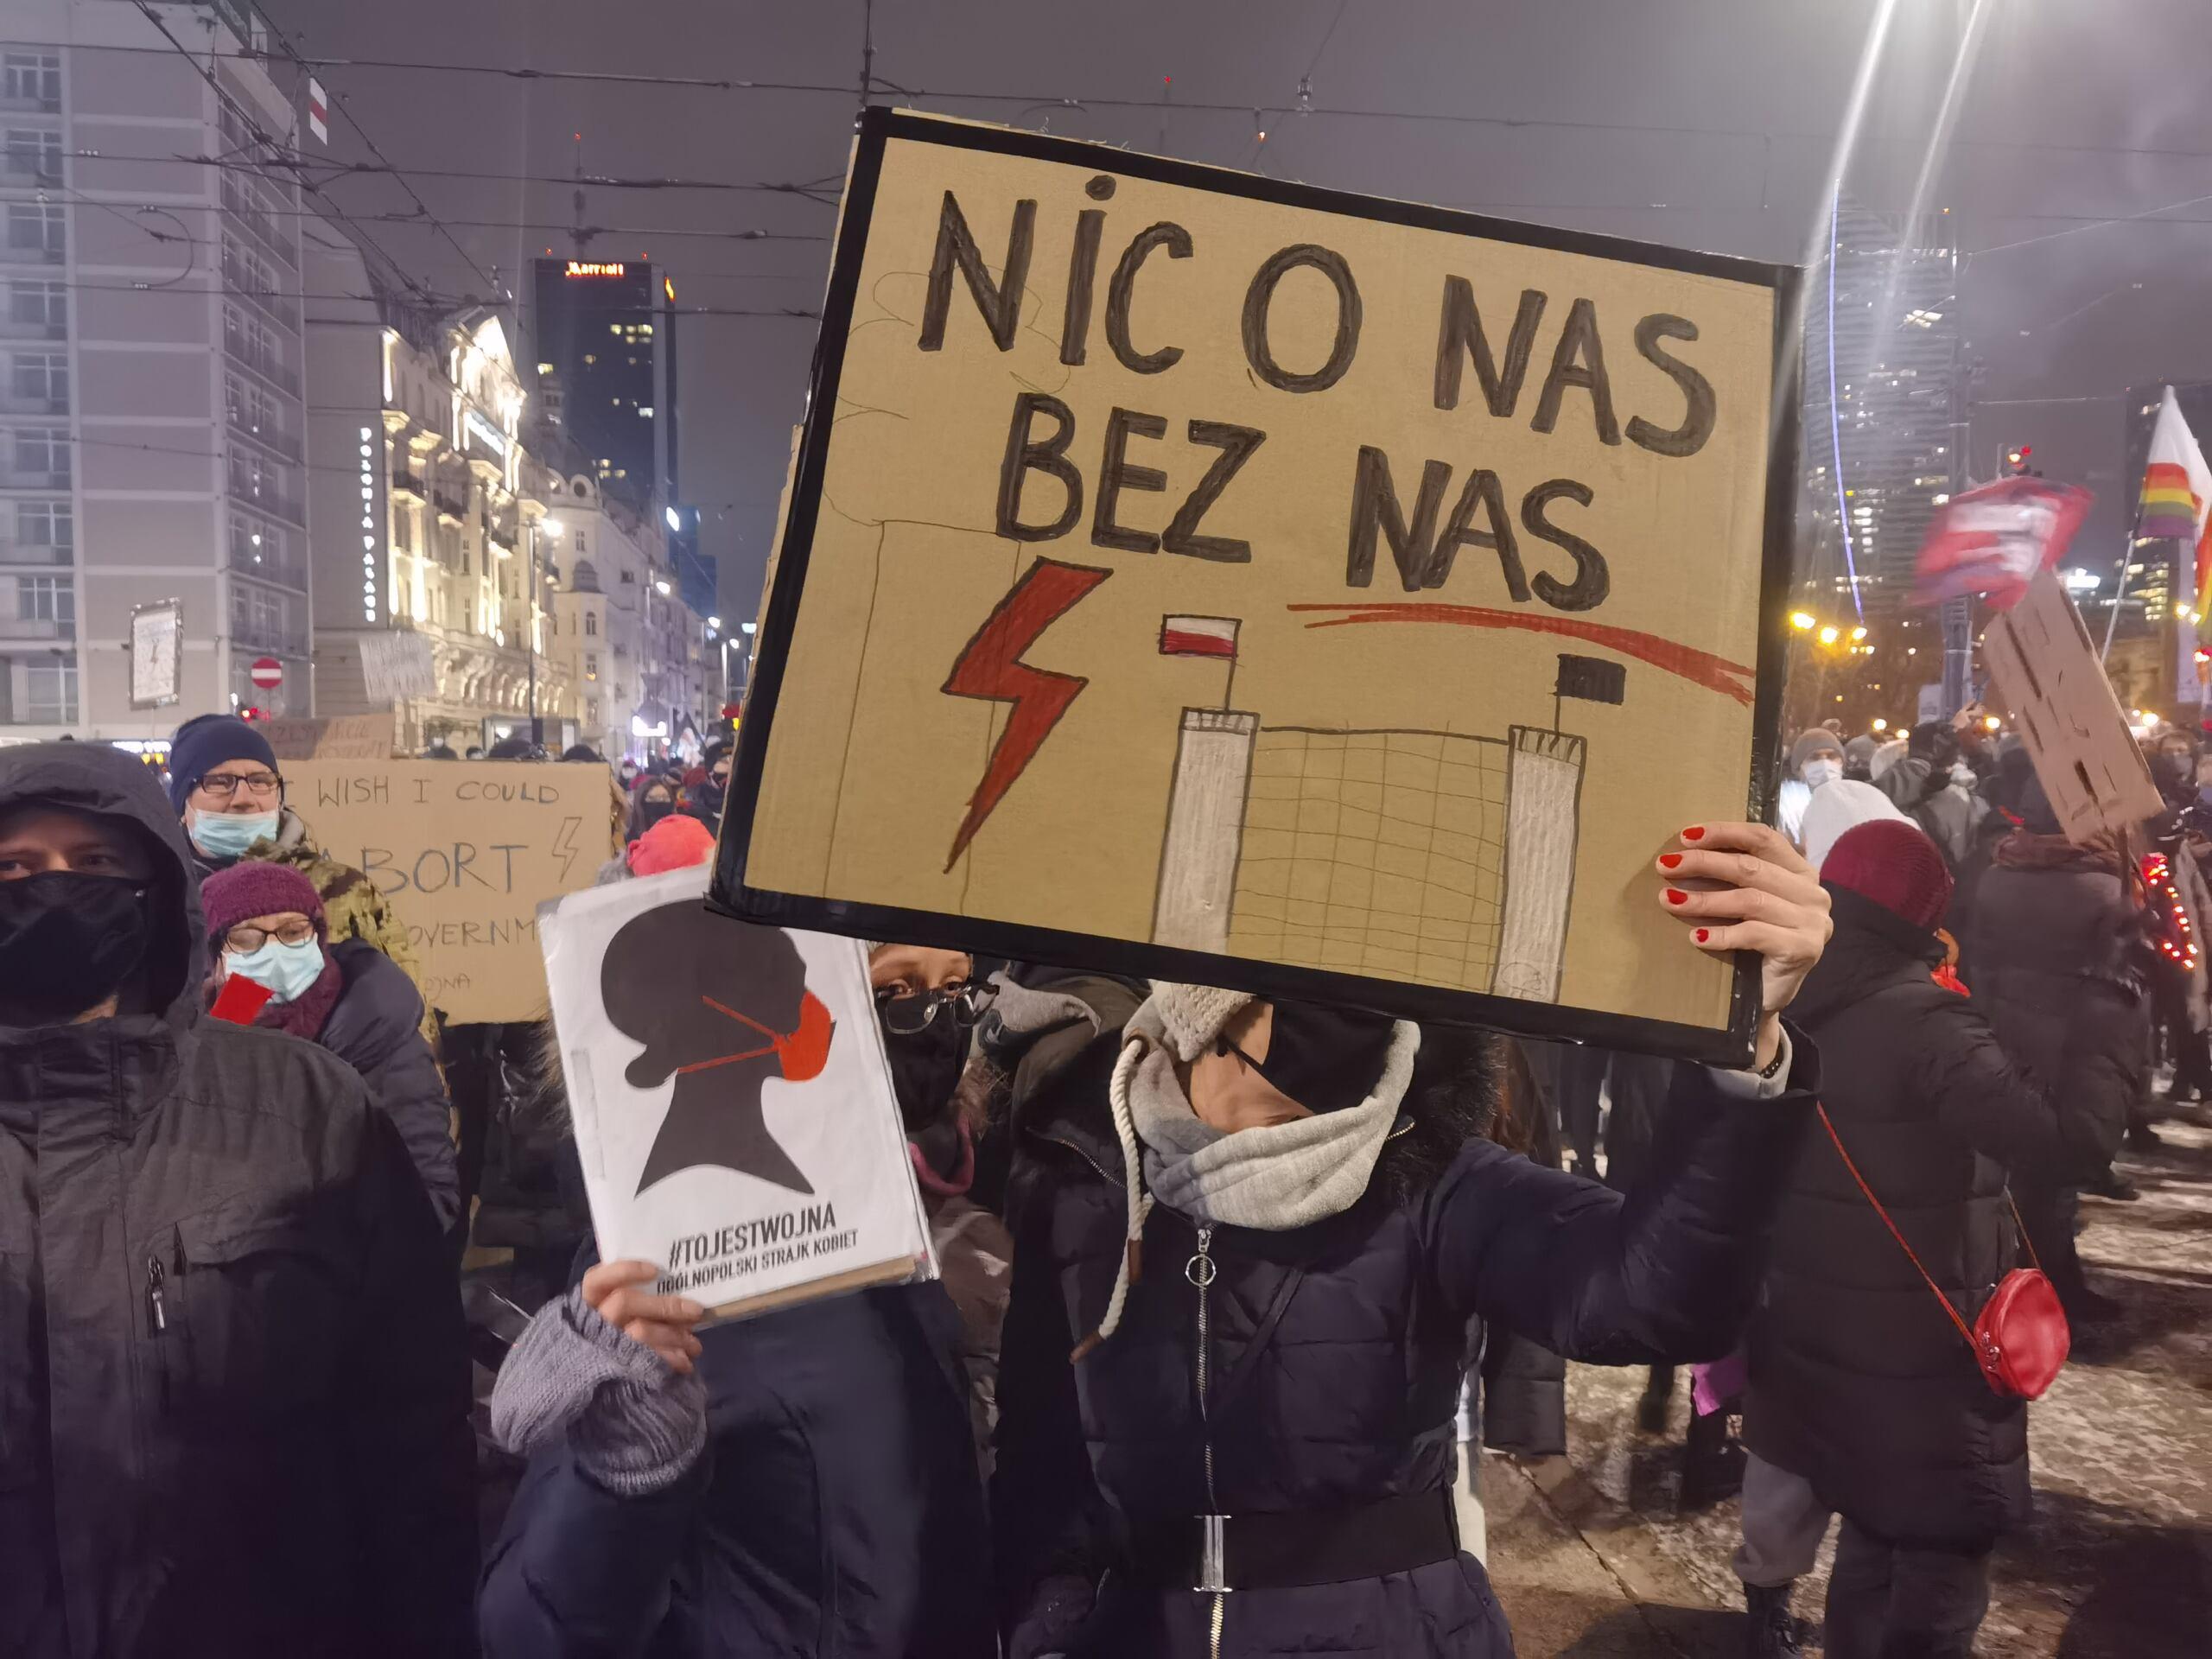 """Nic o nas bez nas"", Strajk Kobiet, 29 stycznia 2021, fot. Robert Jurszo"